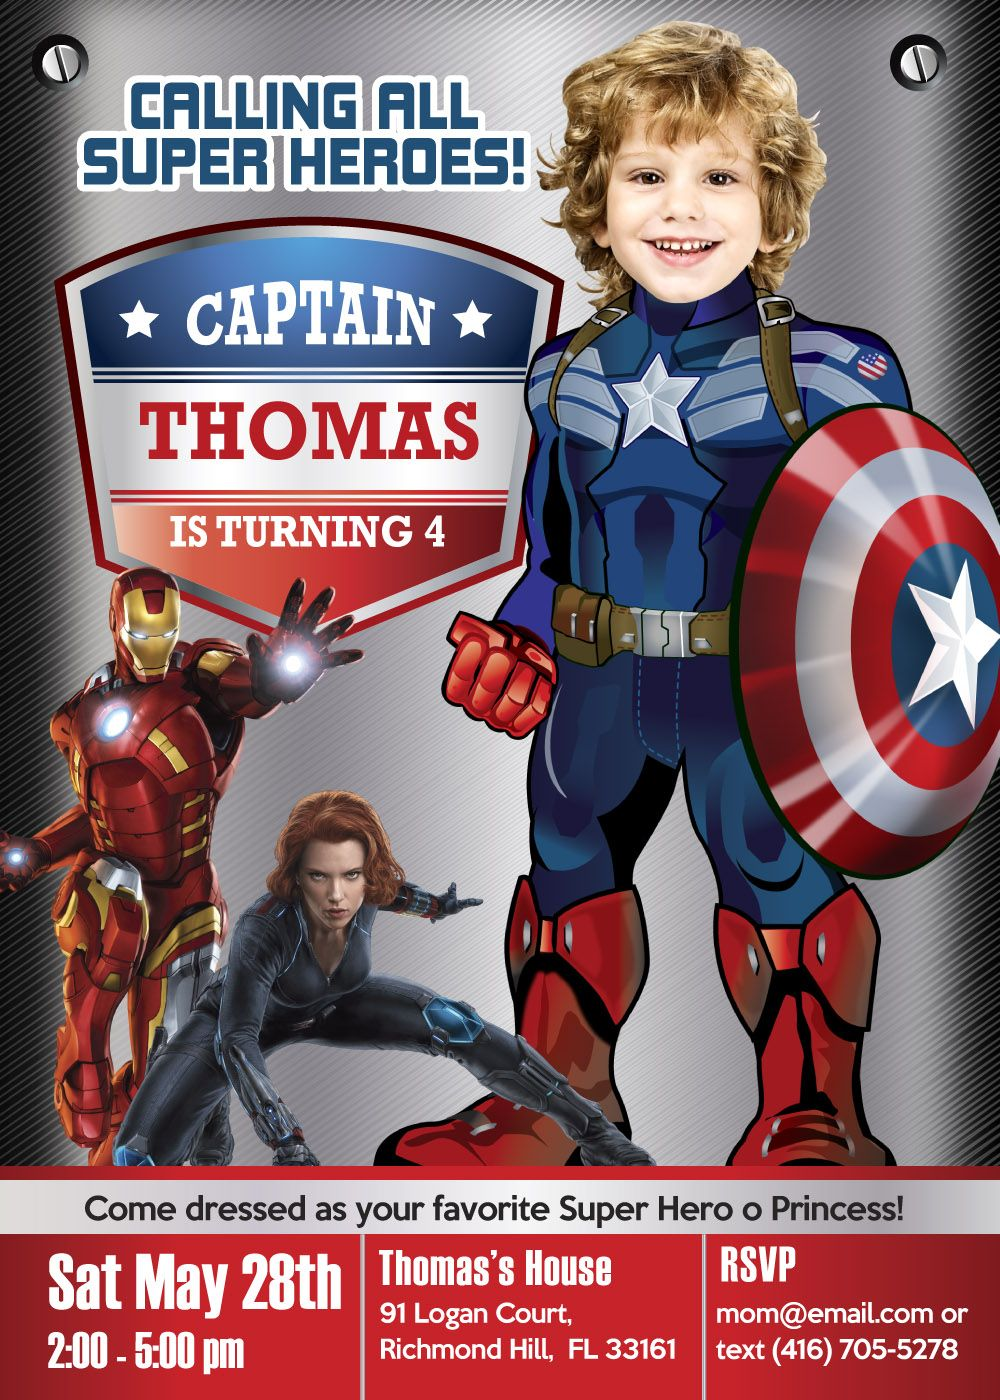 Turn Your Boy Into His Favorite Super Hero Captain America Captain America Invitation Captain Captain America Party Captain America Birthday America Birthday